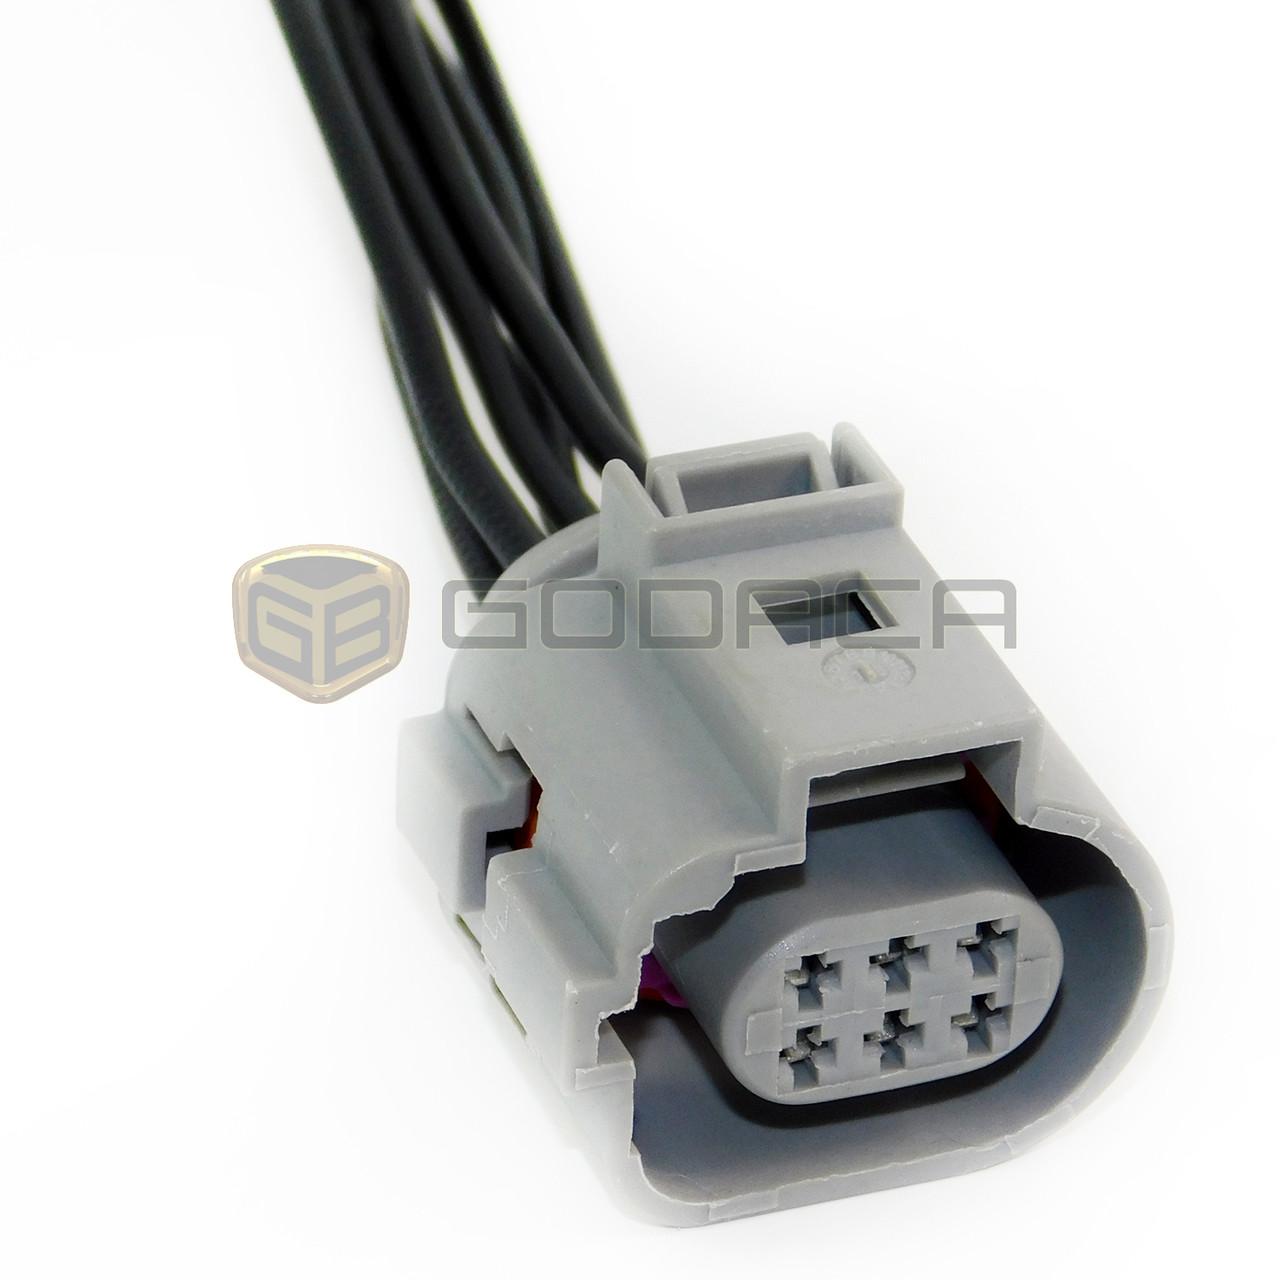 1x 6 pin connector pigtail ford transit egr valve wiring repair kit rh godaca com ford transit egr valve wiring Ford EGR Valve Cleaning